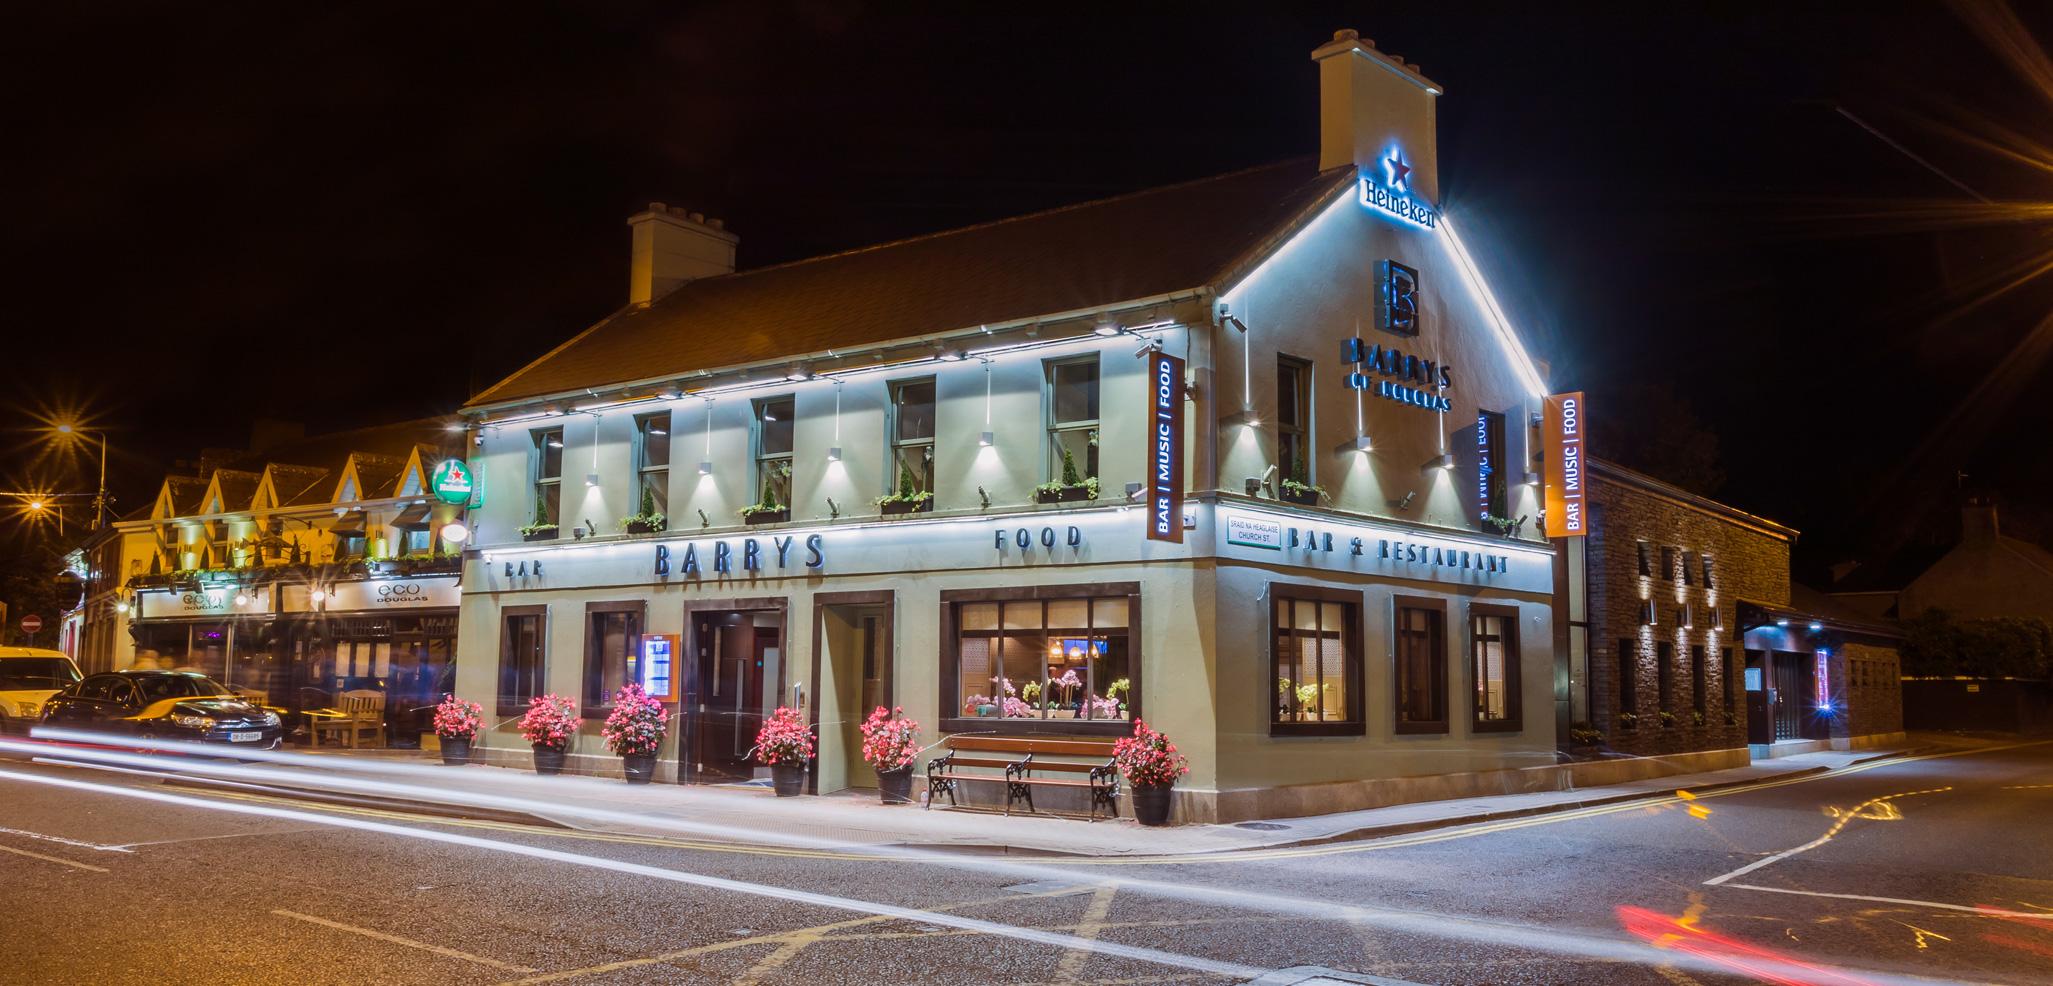 Barrys of Douglas Bar & Restaurant Situated in Douglas, Cork City